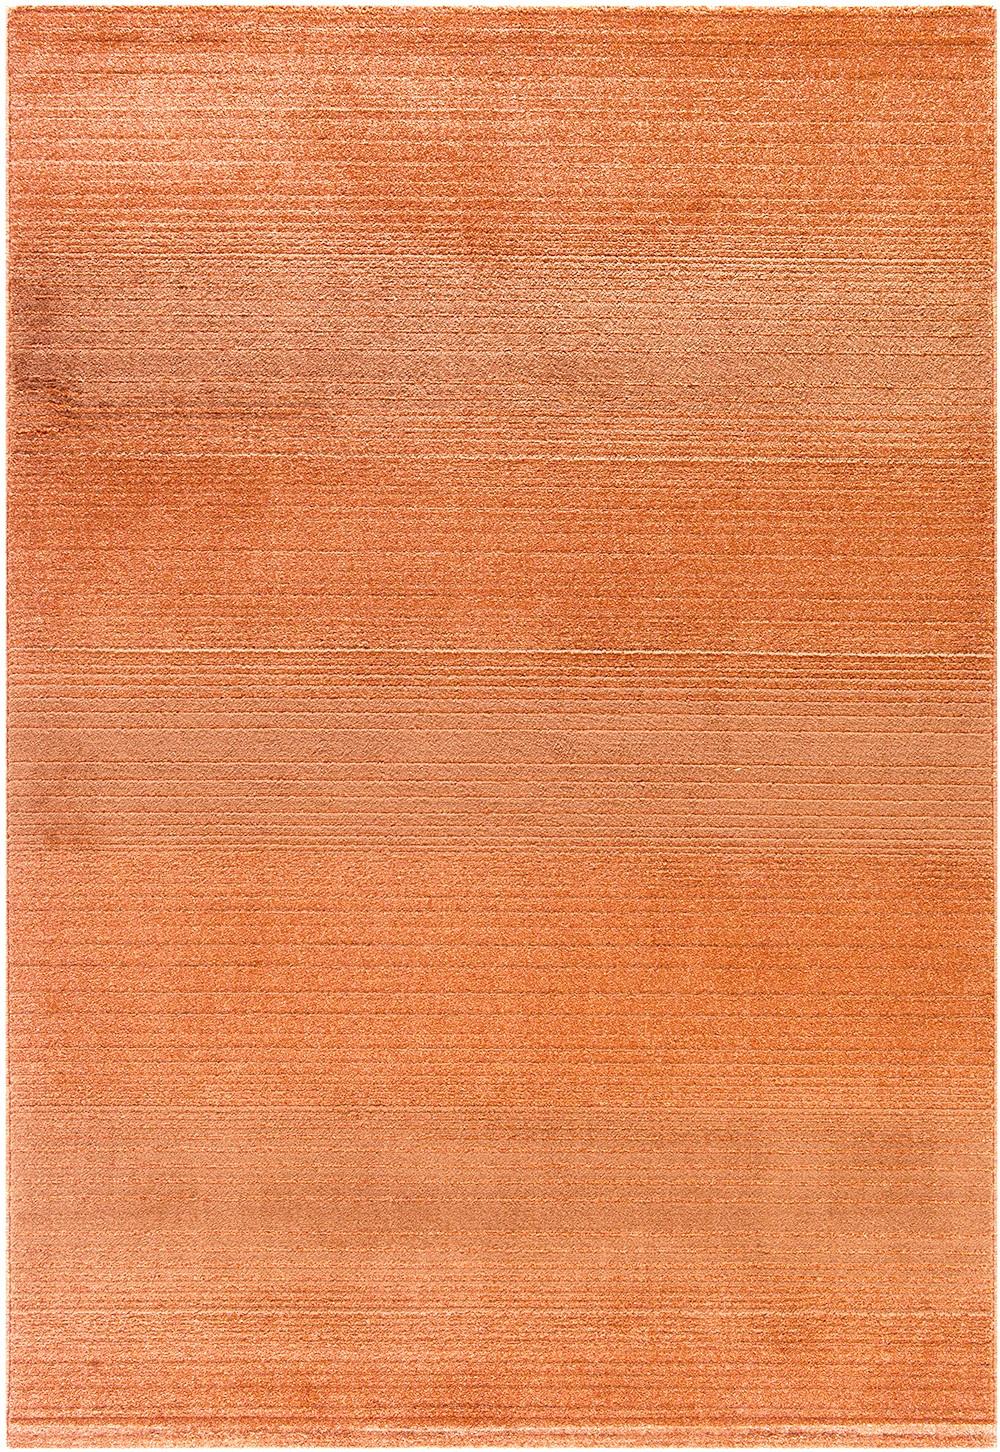 tapis design salon tapis salon orange tapis de salon moderne grand tapis de - Tapis Orange